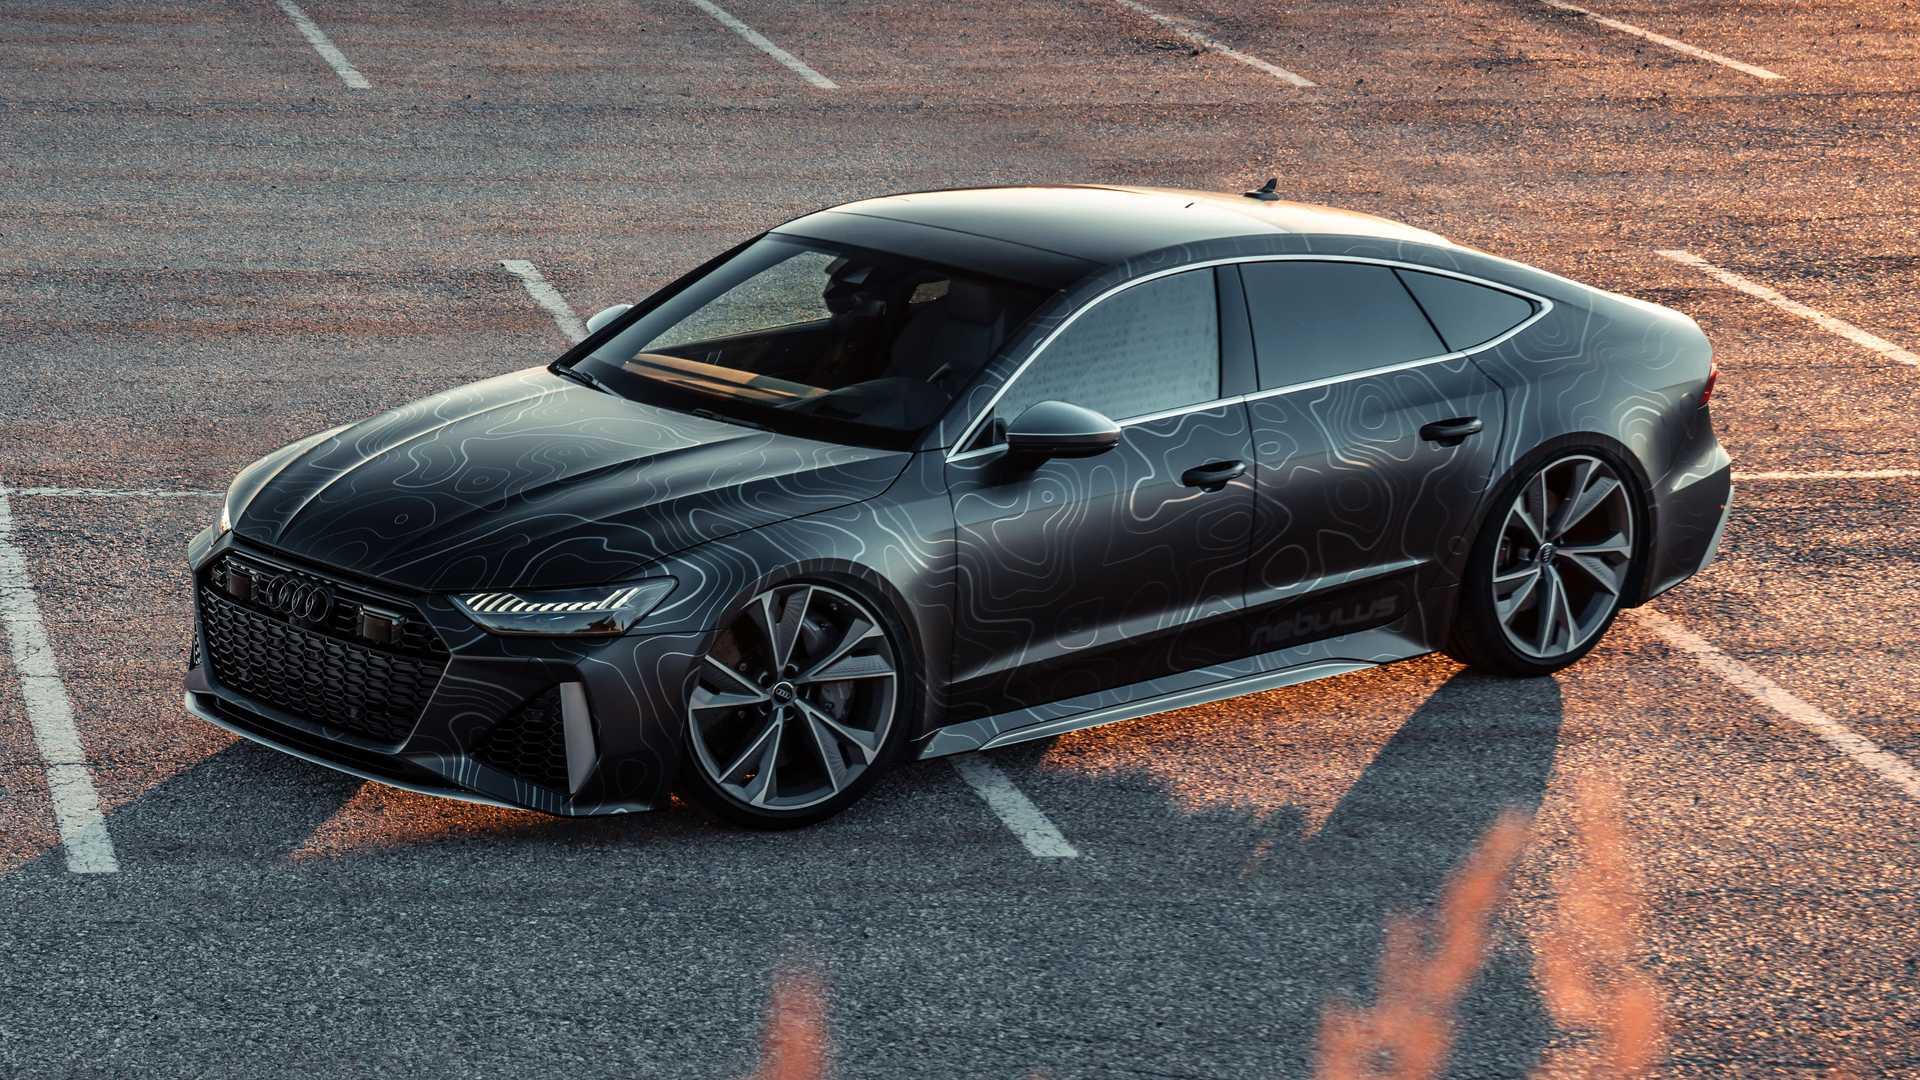 Audi-RS7-By-Black-Box-Richter-7